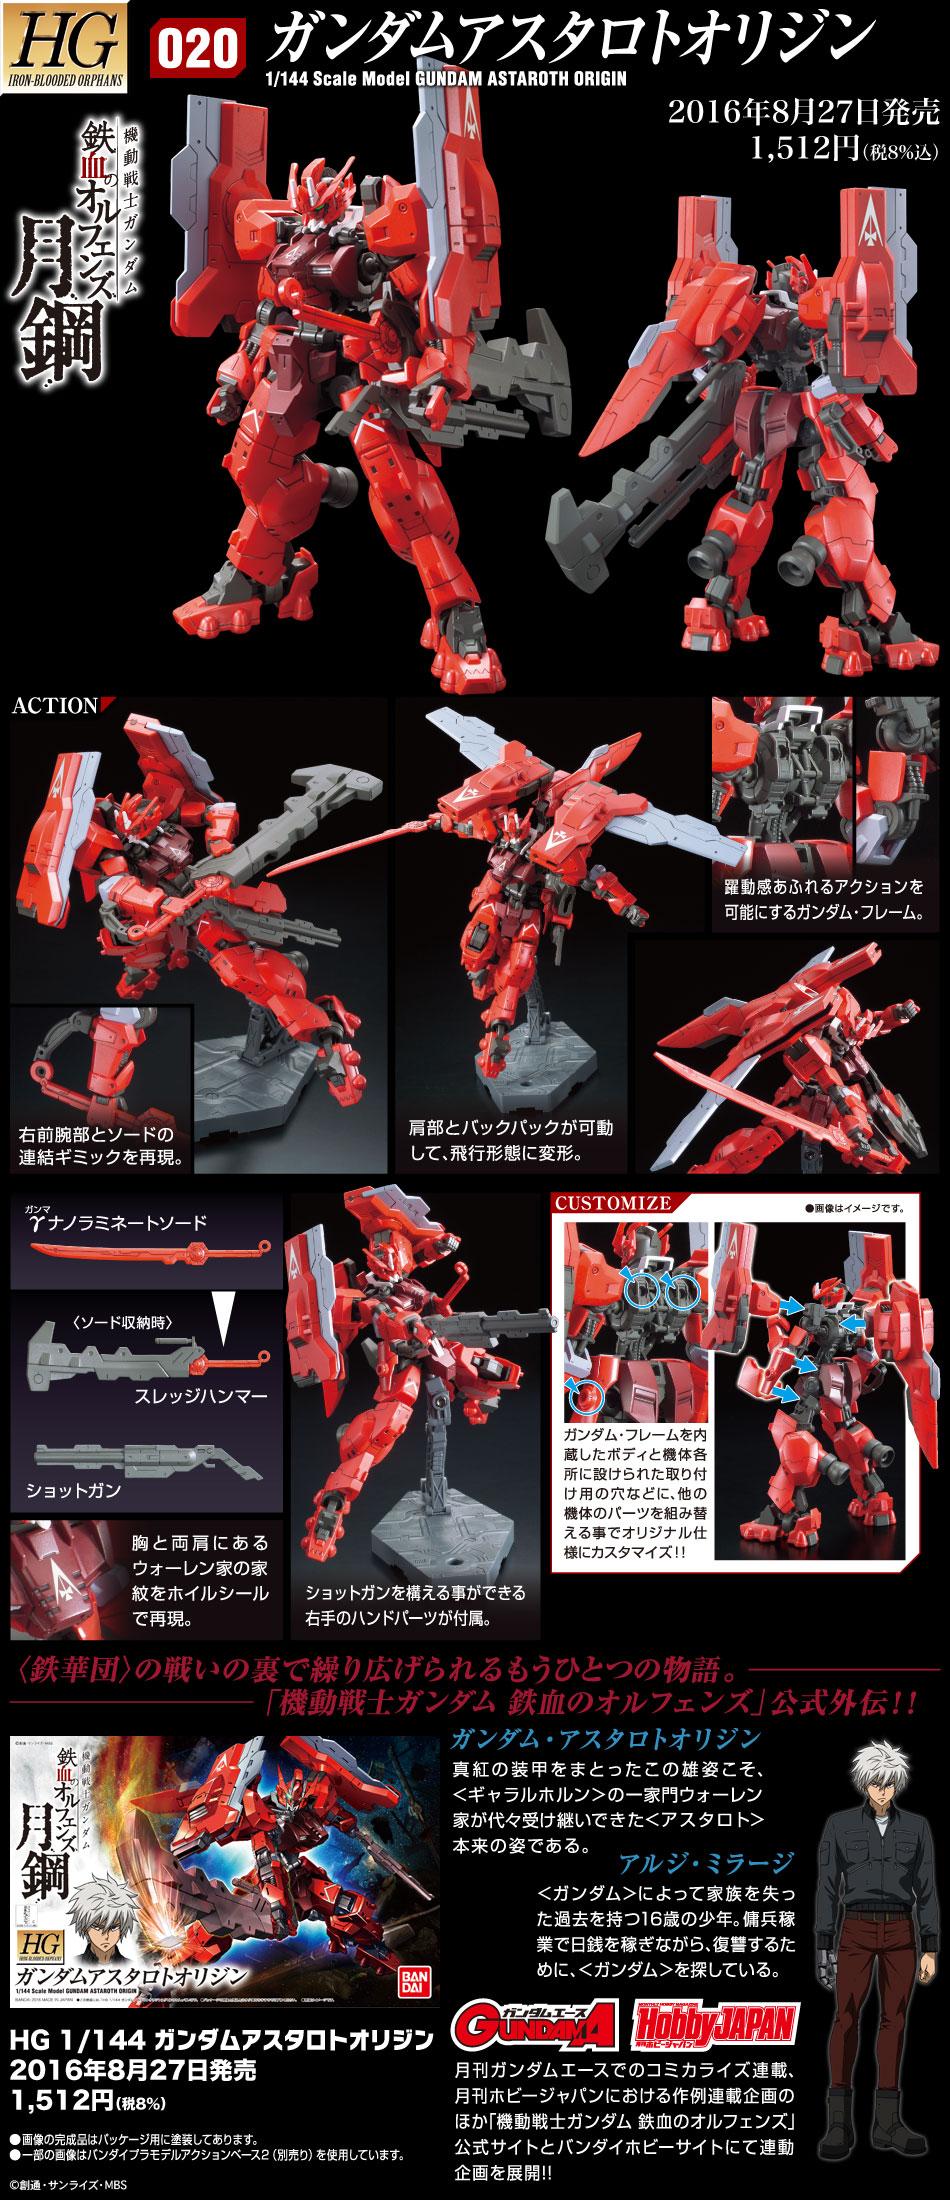 HG 1/144 ASW-G-29 ガンダムアスタロトオリジン [Gundam Astaroth Origin] 公式商品説明(画像)